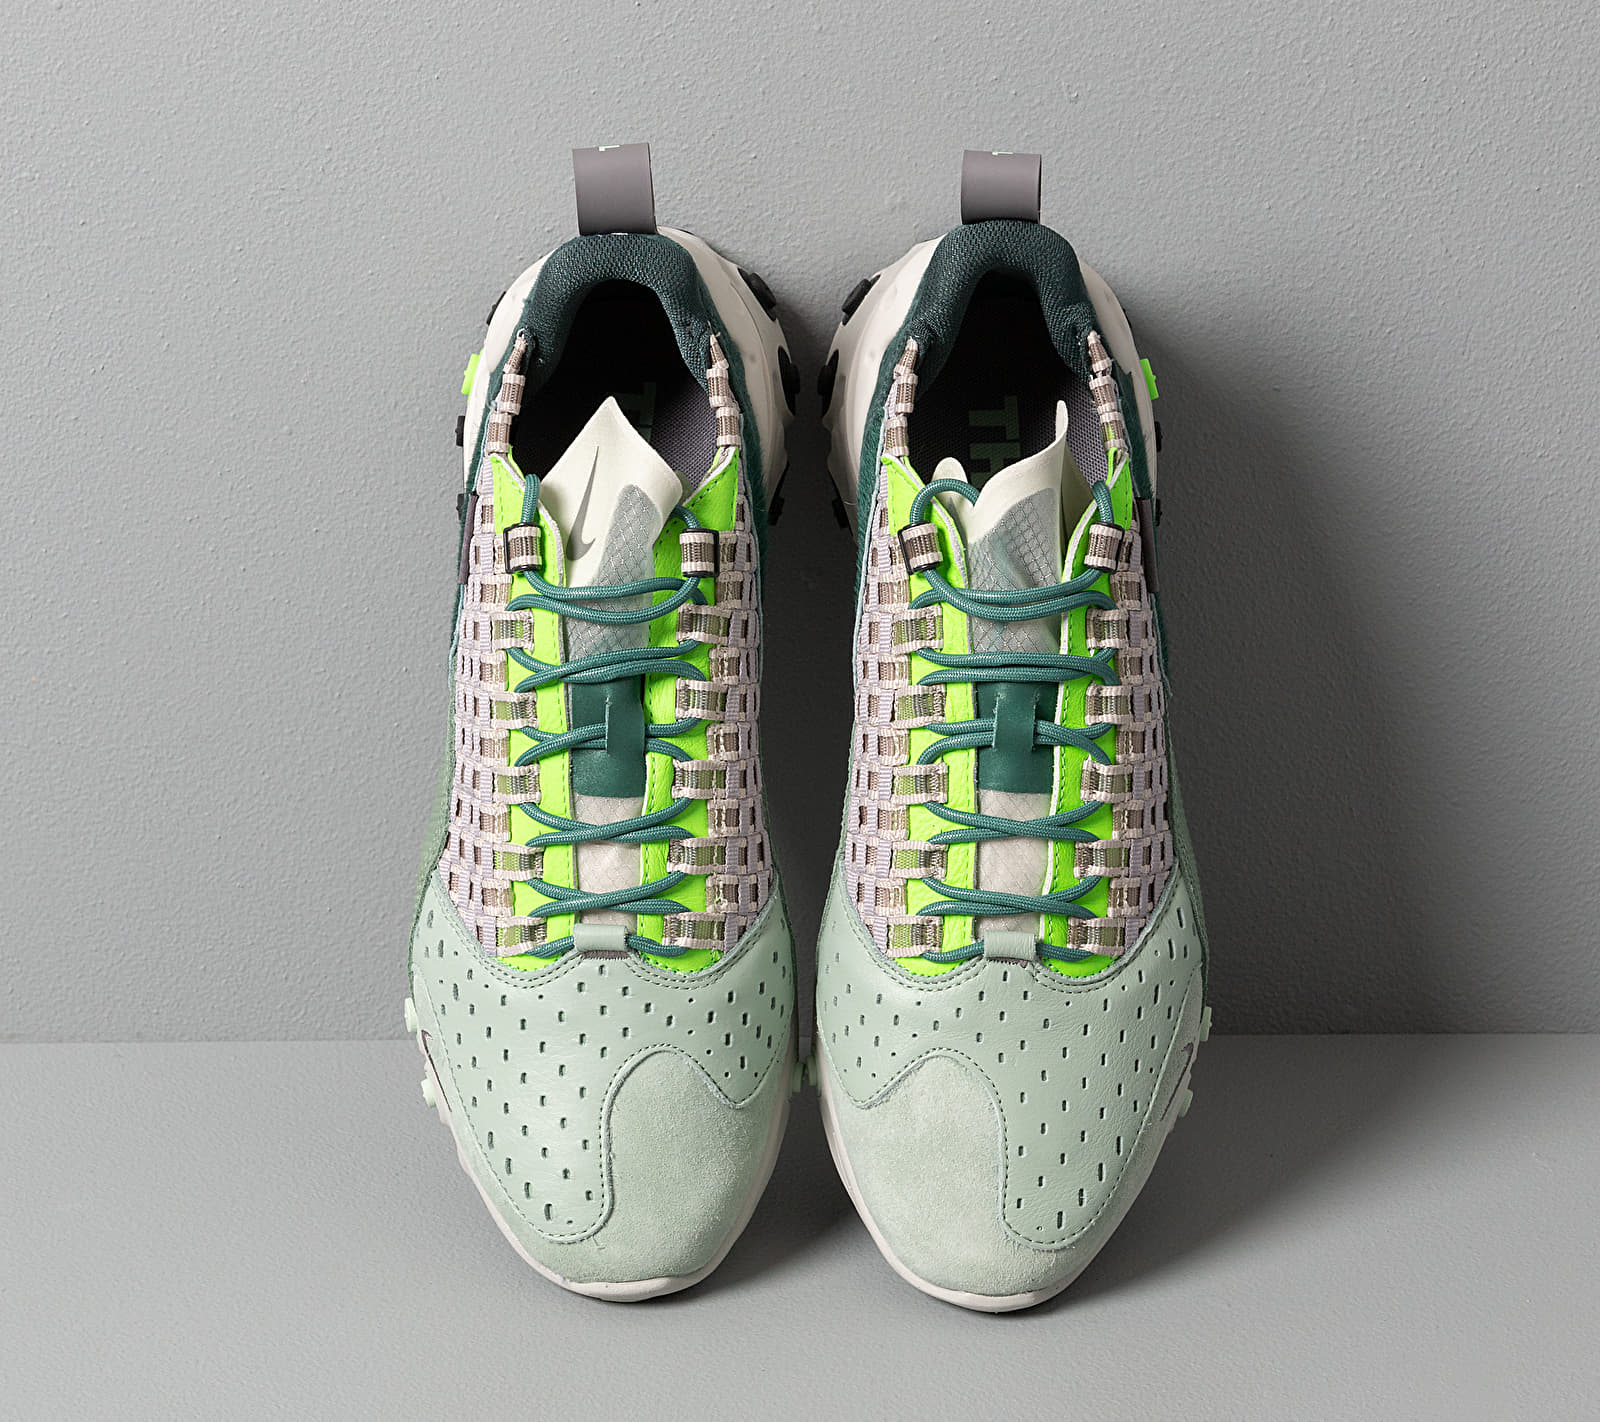 Nike React Sertu Faded Spruce/ Gunsmoke-Bicoastal, Green